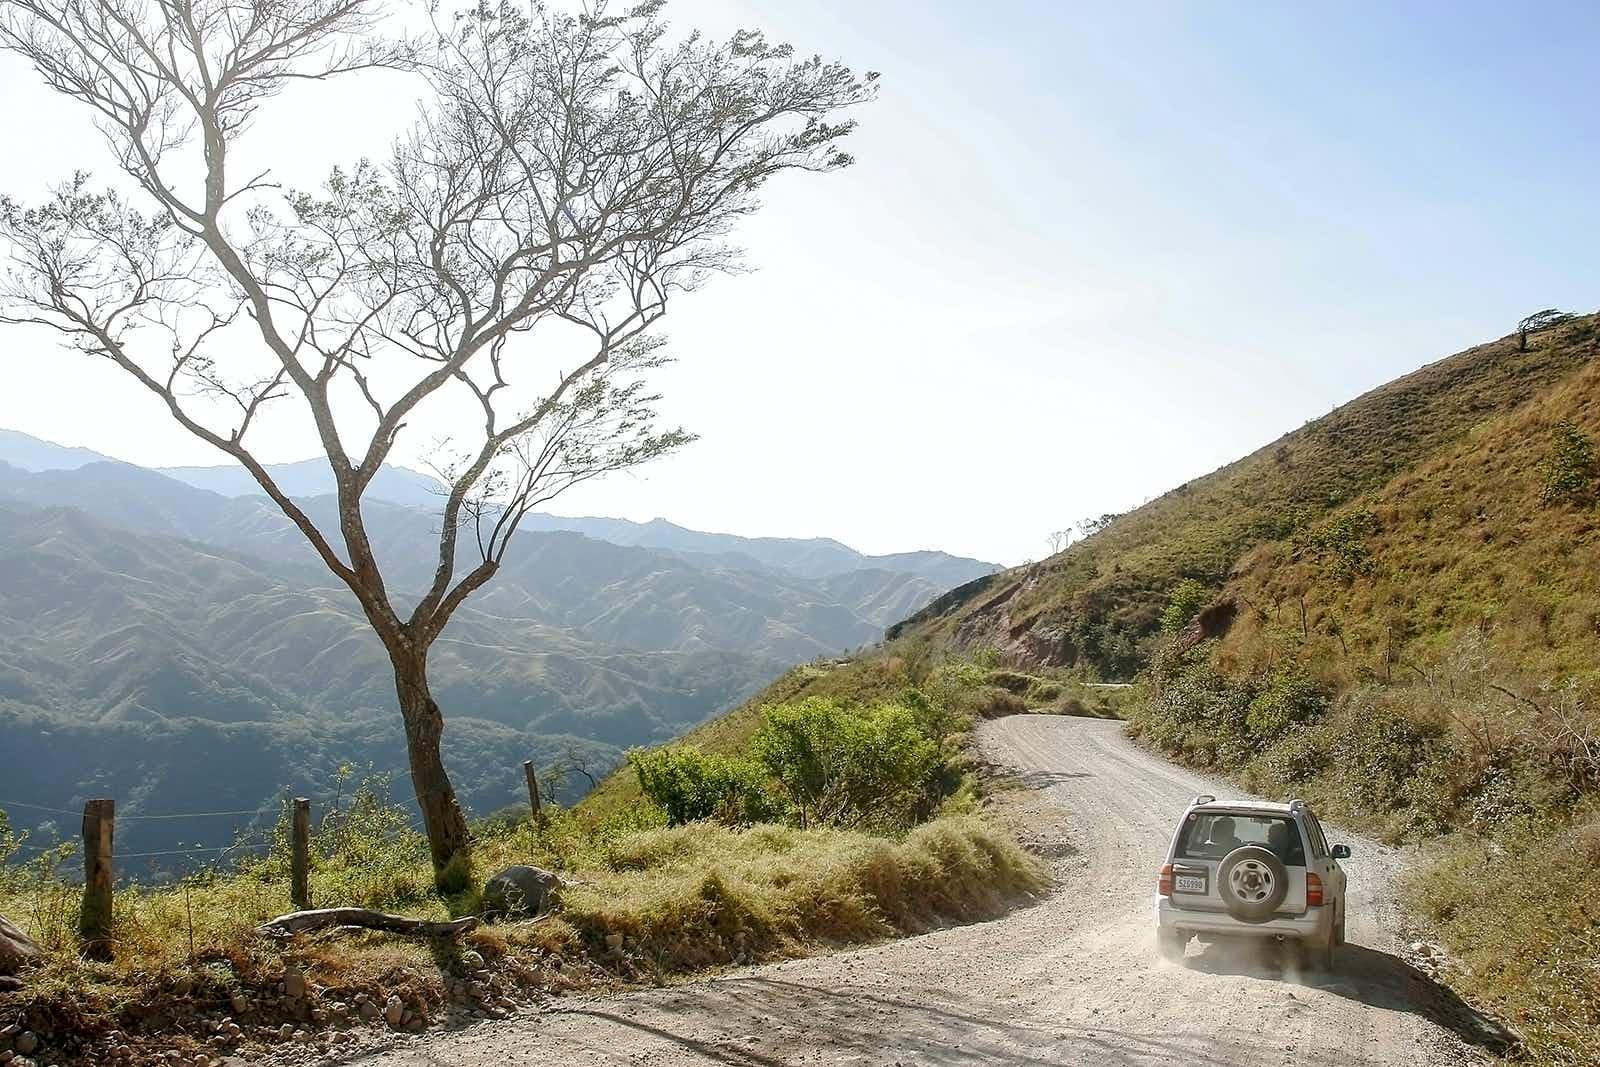 Top five nerve-shredding road trips in Costa Rica